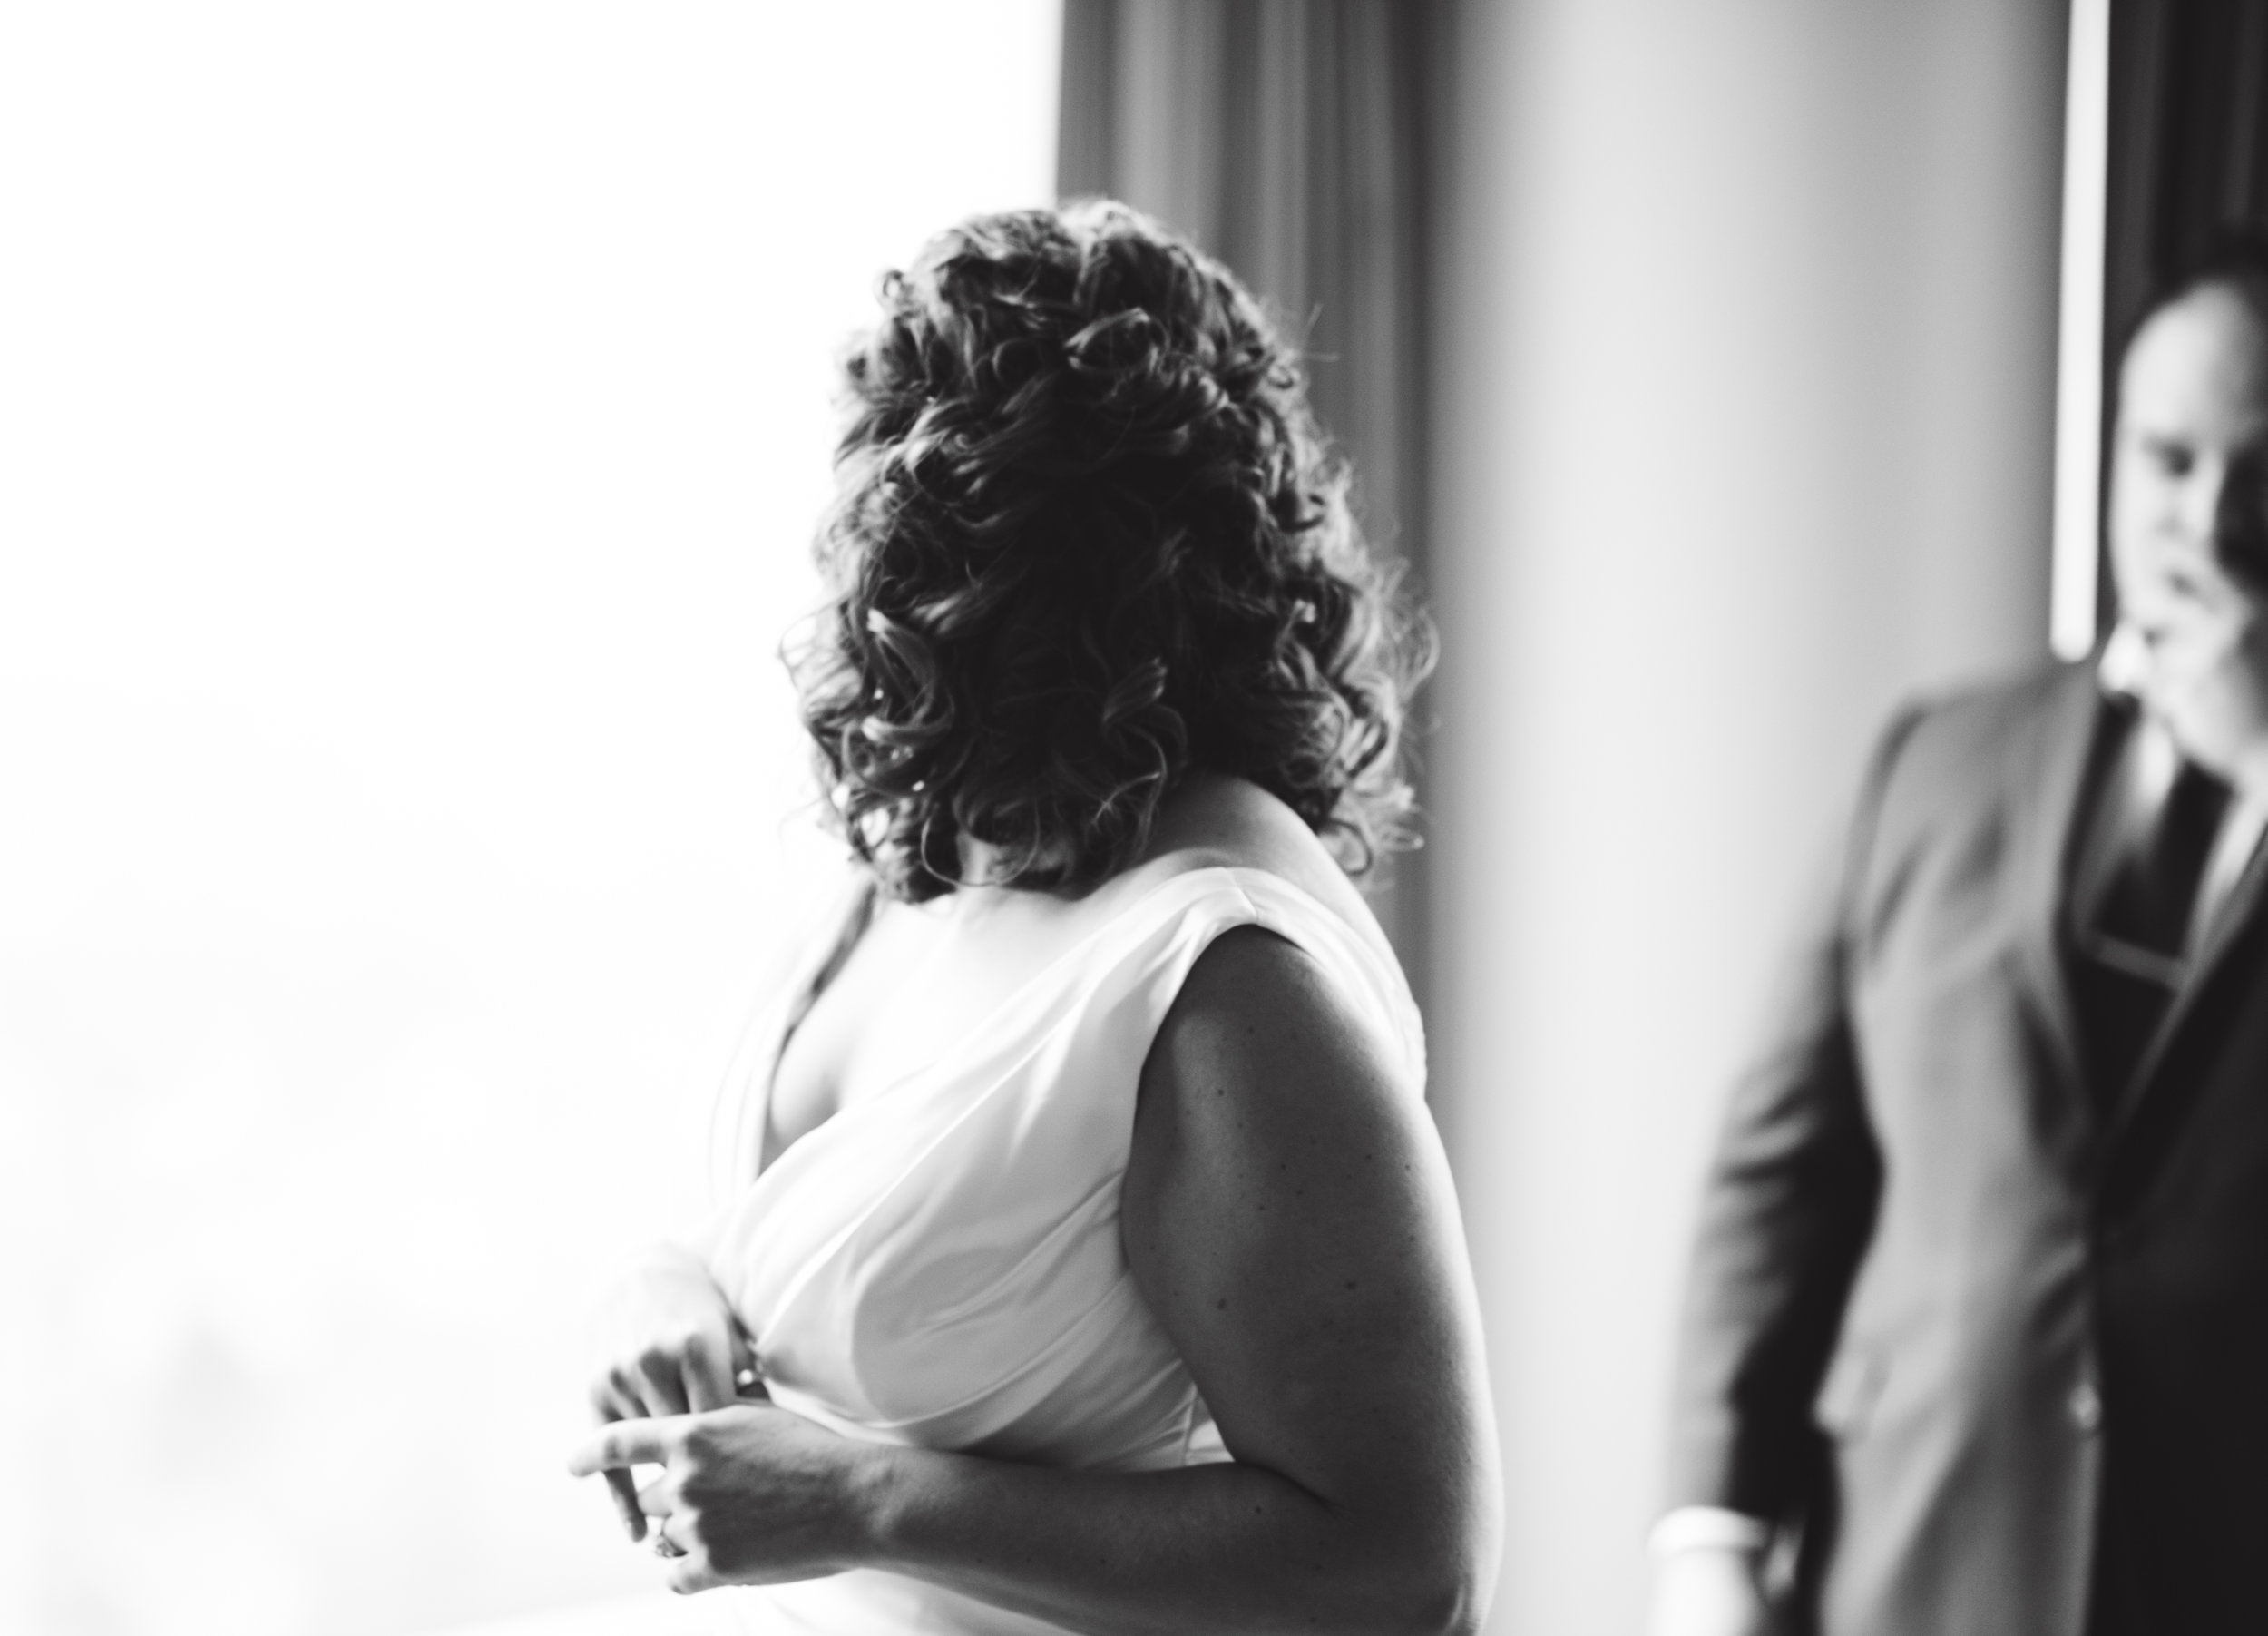 LIZA & JON - BATTERY PARK WEDDING - NYC INTIMATE WEDDING PHOTOGRAPHER - CHI-CHI AGBIM-129.jpg